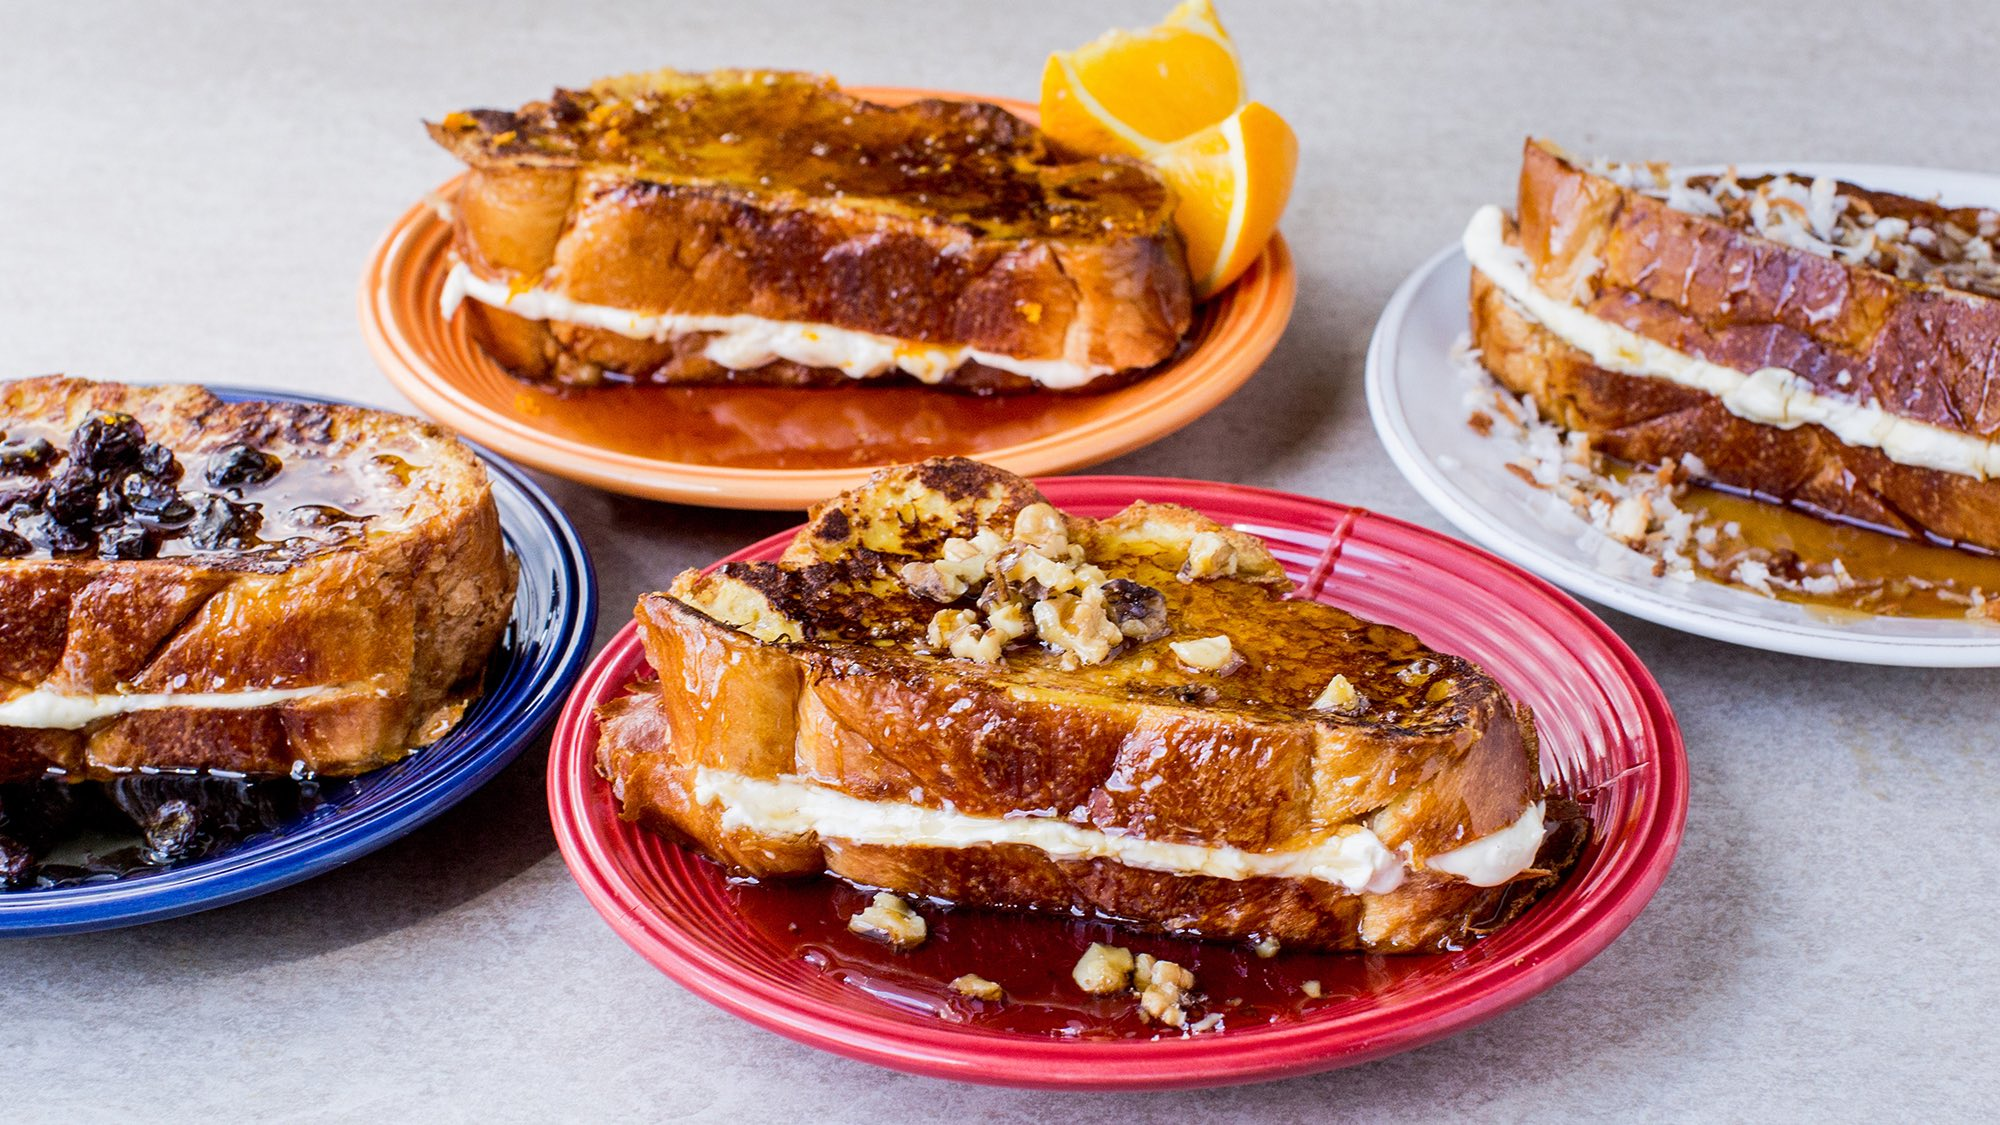 creamy-stuffed-french-toast.jpg